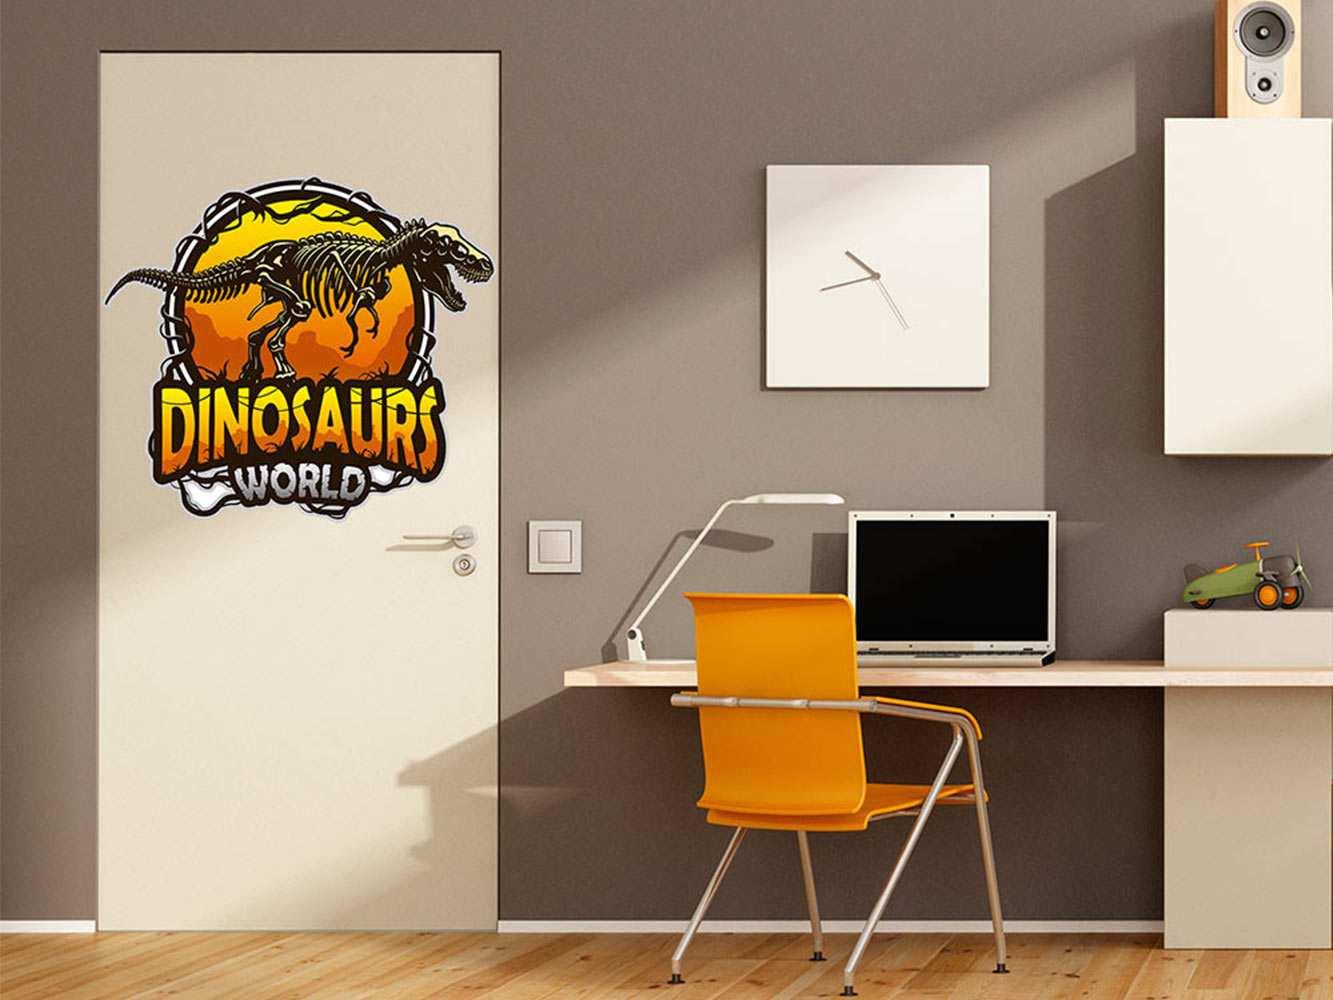 Vinilo Decorativo Puerta Dinosaurs World | Carteles XXL - Impresión carteleria publicitaria